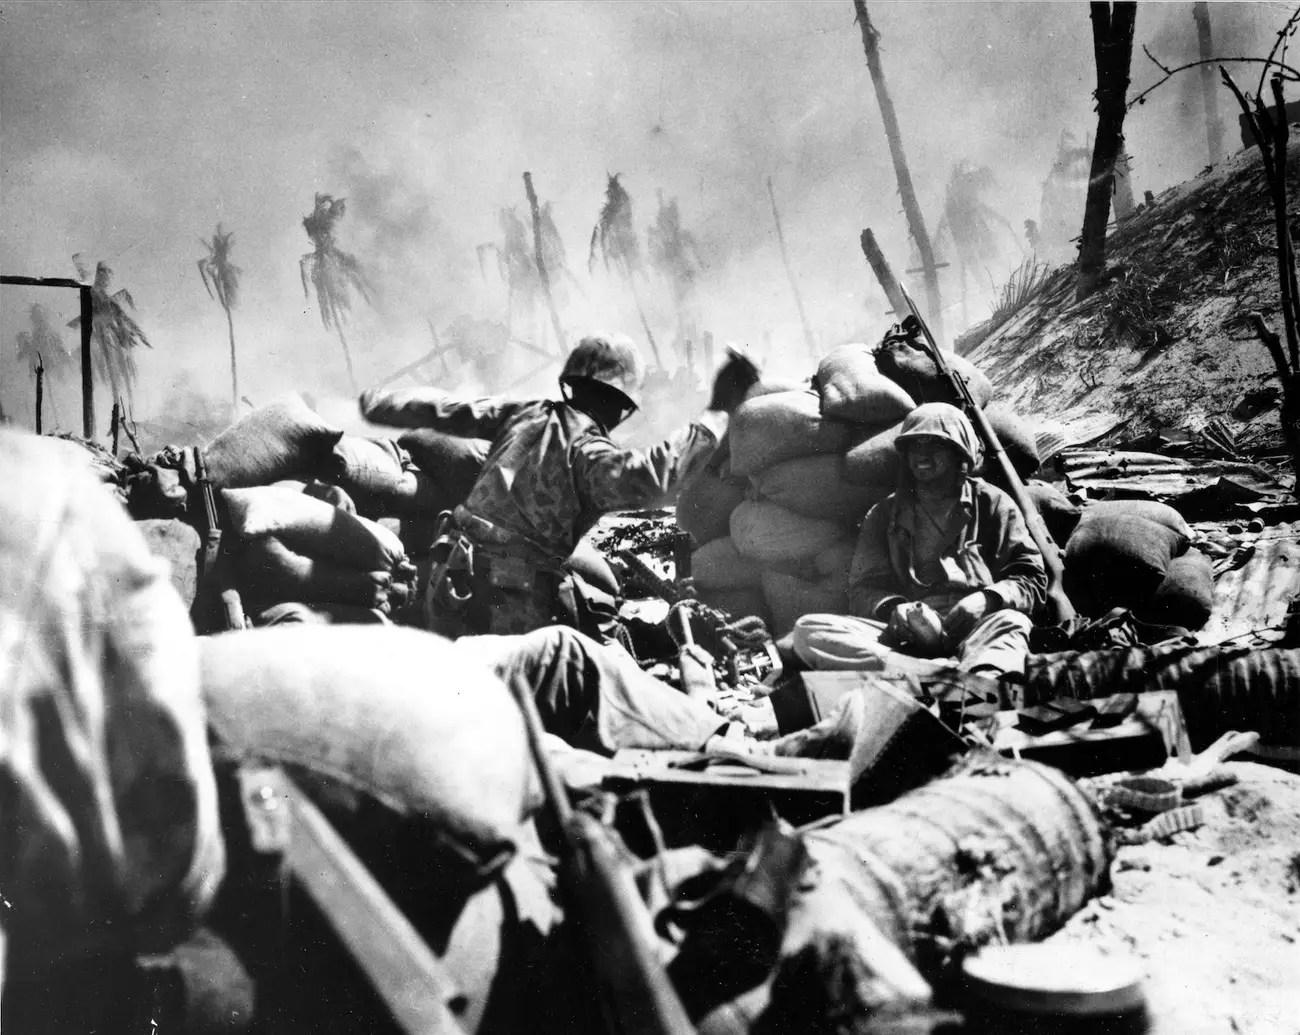 Marines Battle of Tarawa throw grenade